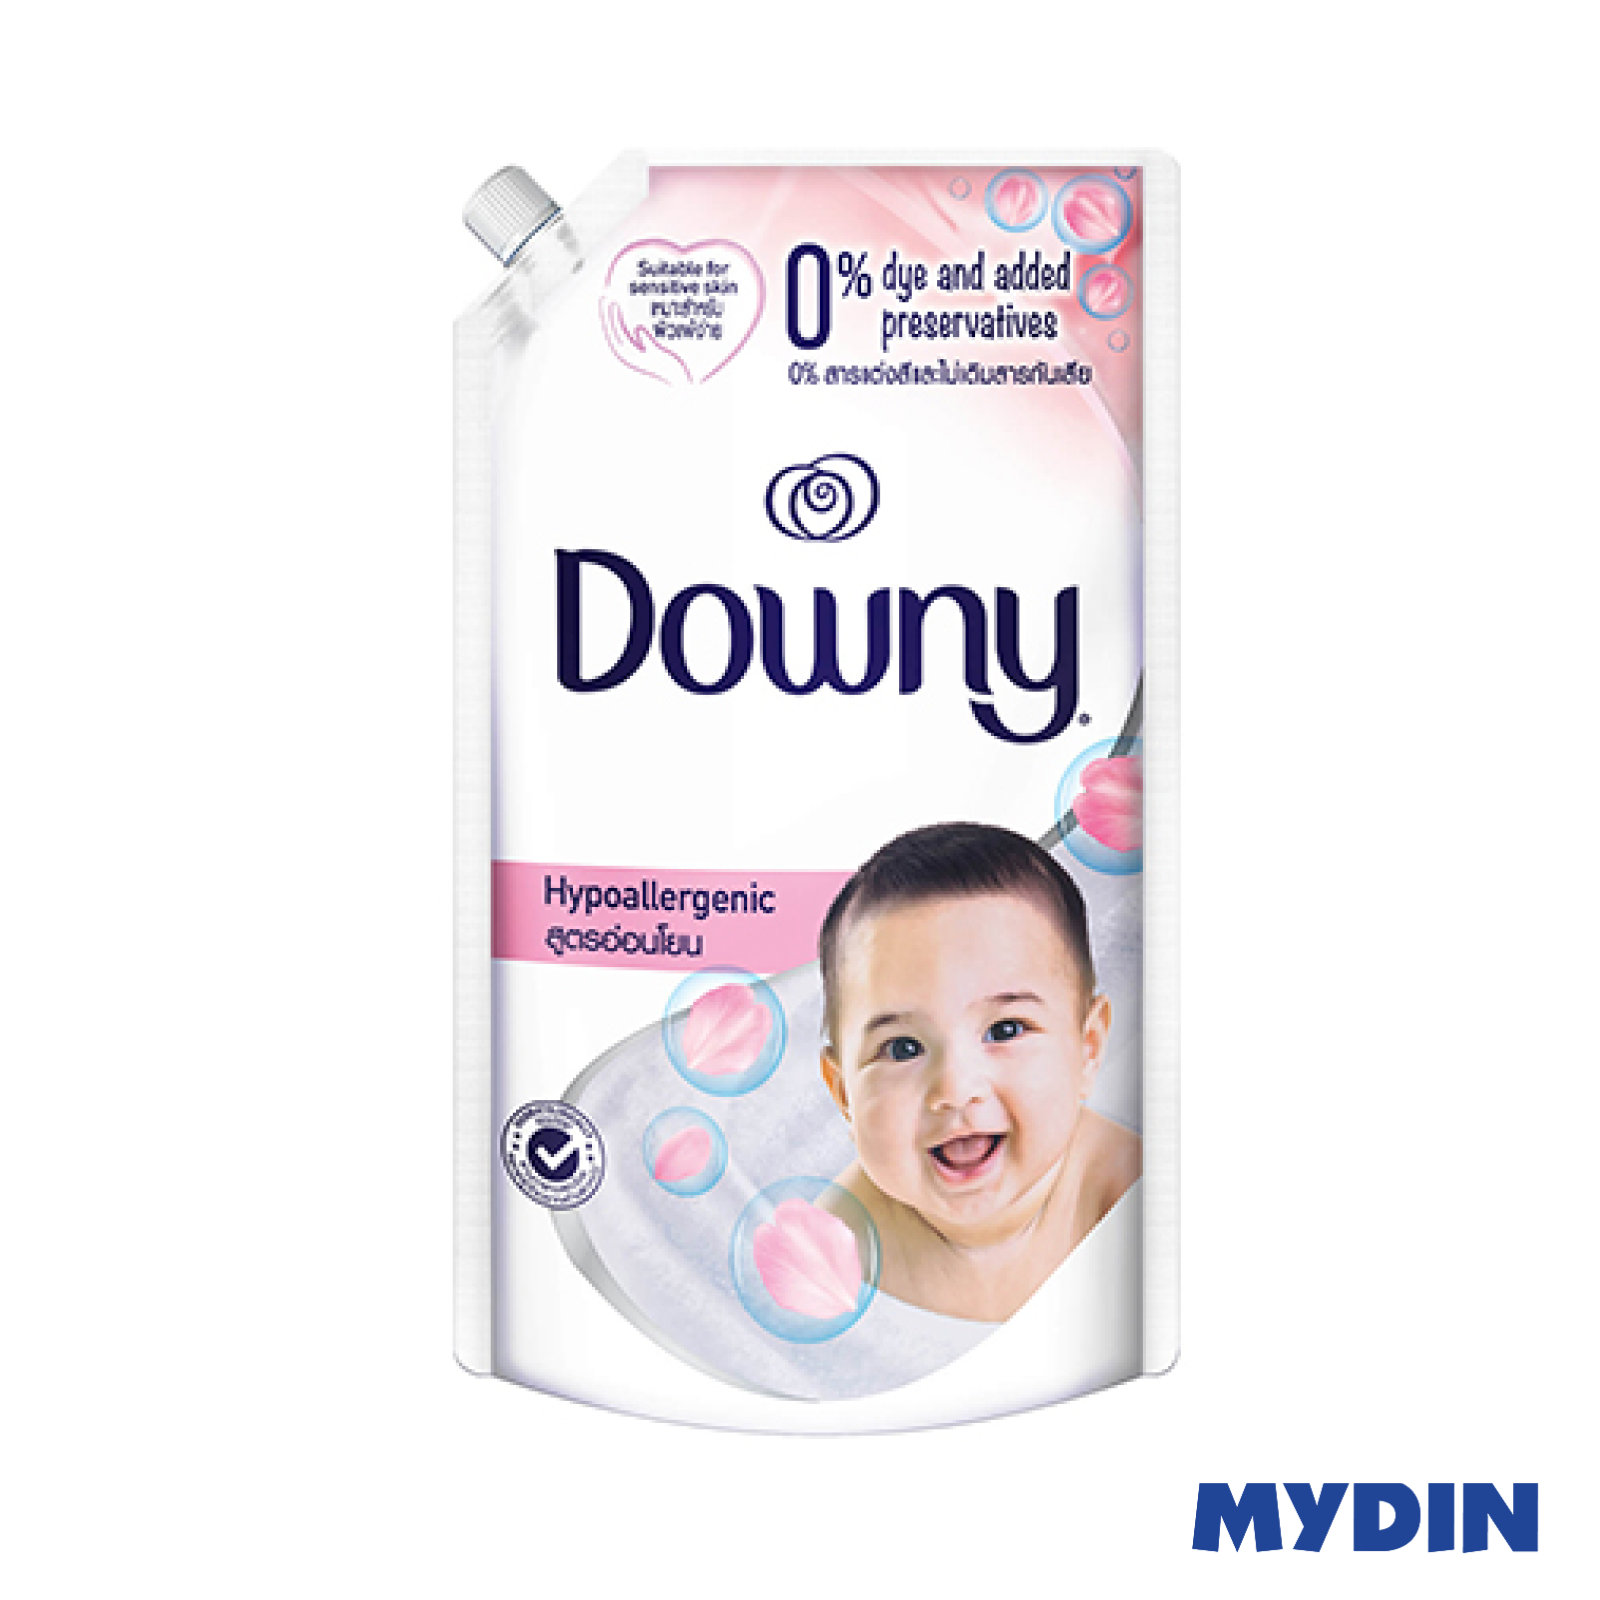 Downy Fabric Softener Baby Hypoallergenic Refill Pack (540ml)